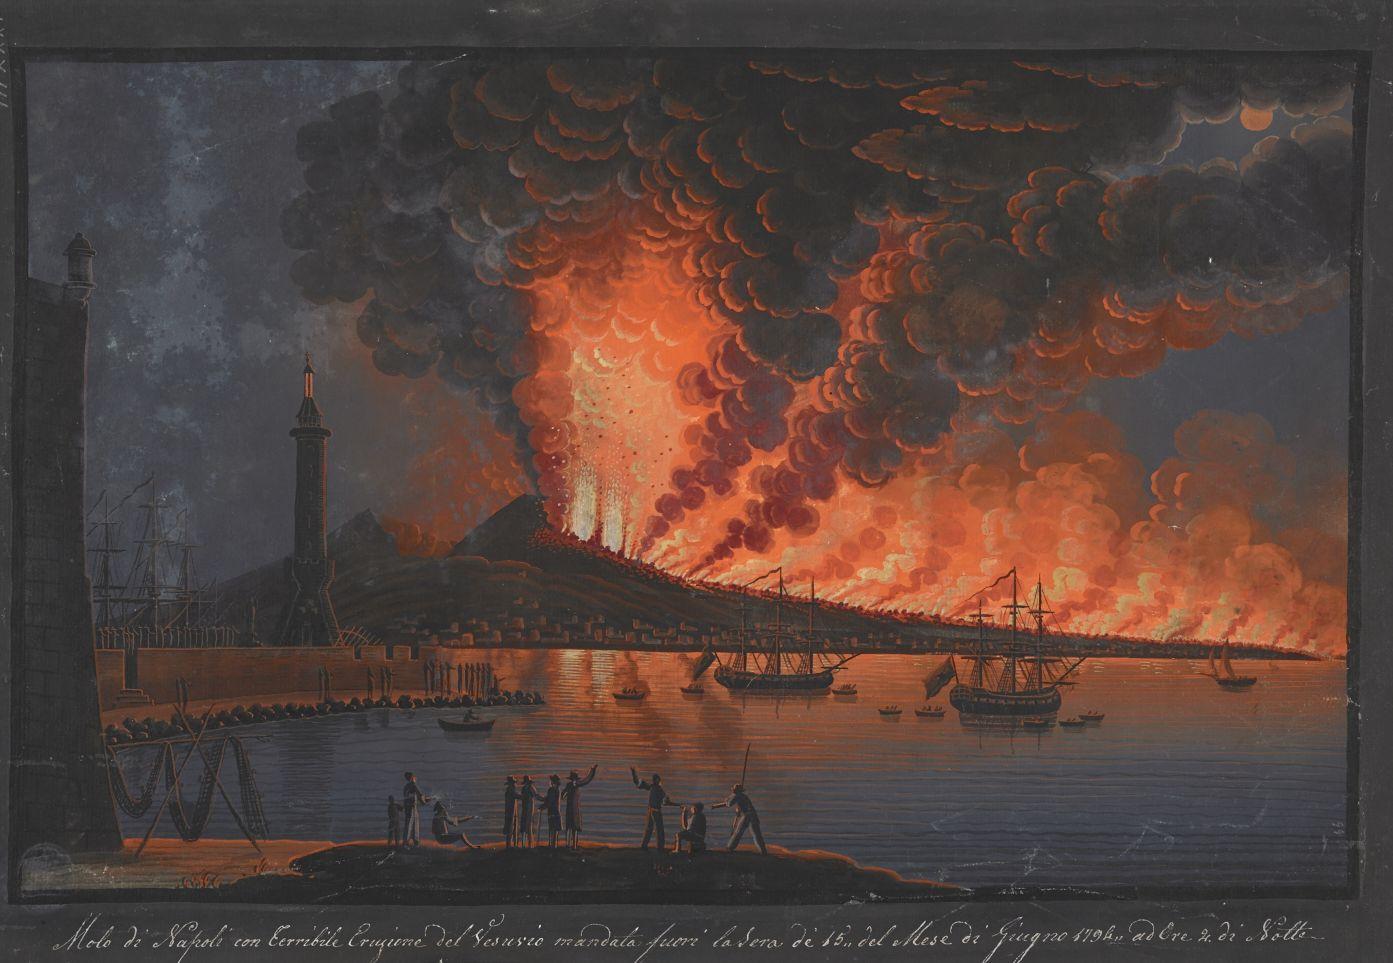 A view of Vesuvius erupting on 15 June 1794